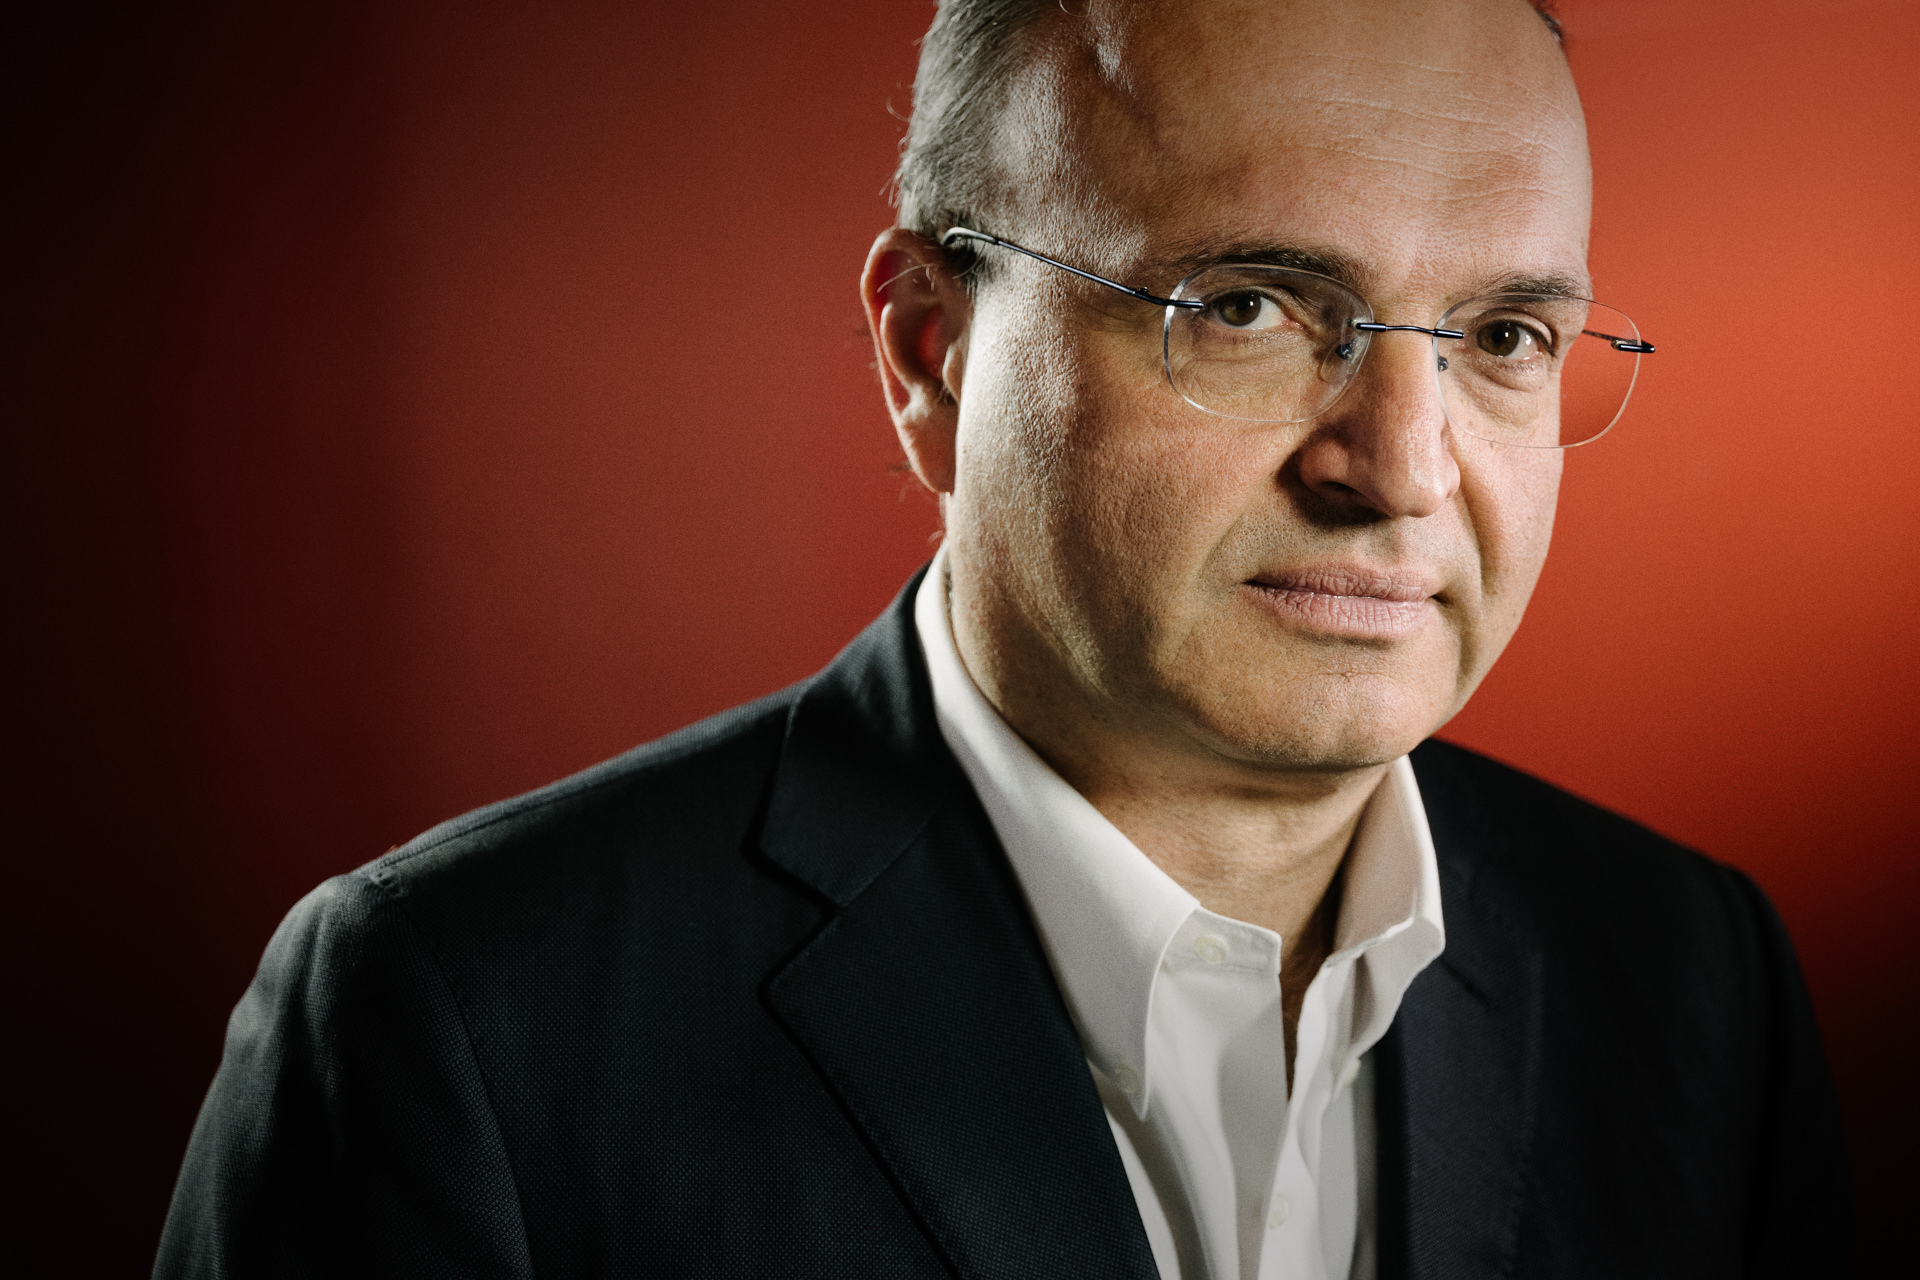 Carlo Alberto Pratesi